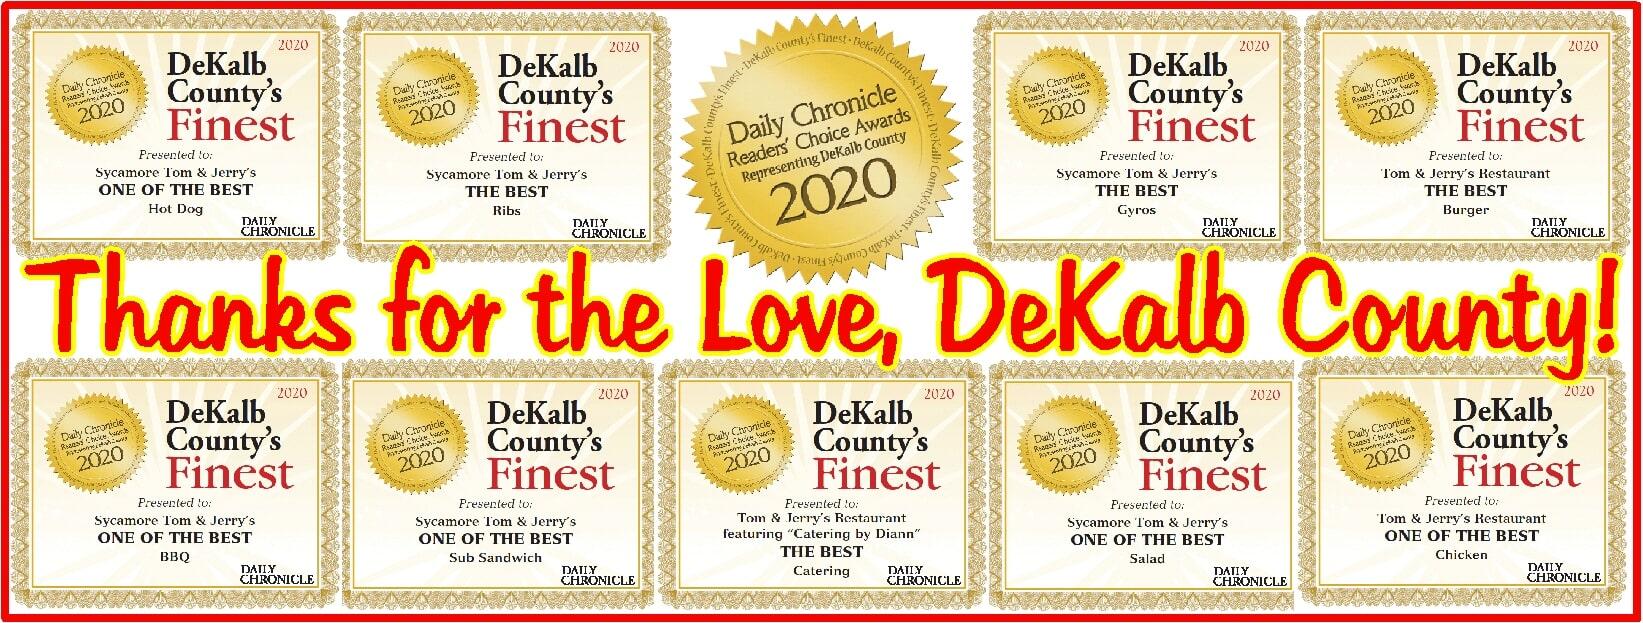 DeKalb County's Finest 2020